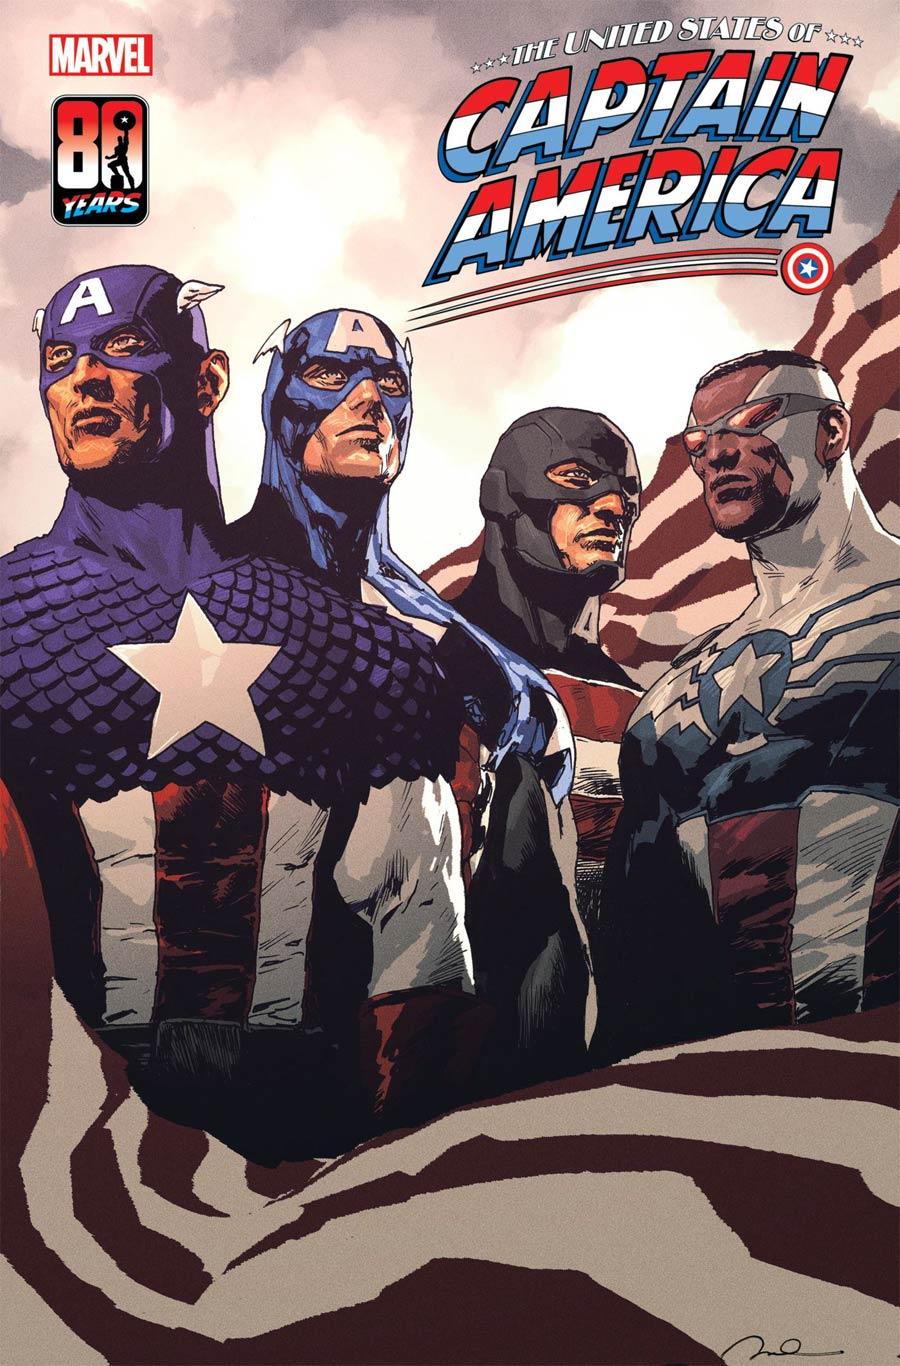 United States Of Captain America #5 Cover A Regular Gerald Parel Cover